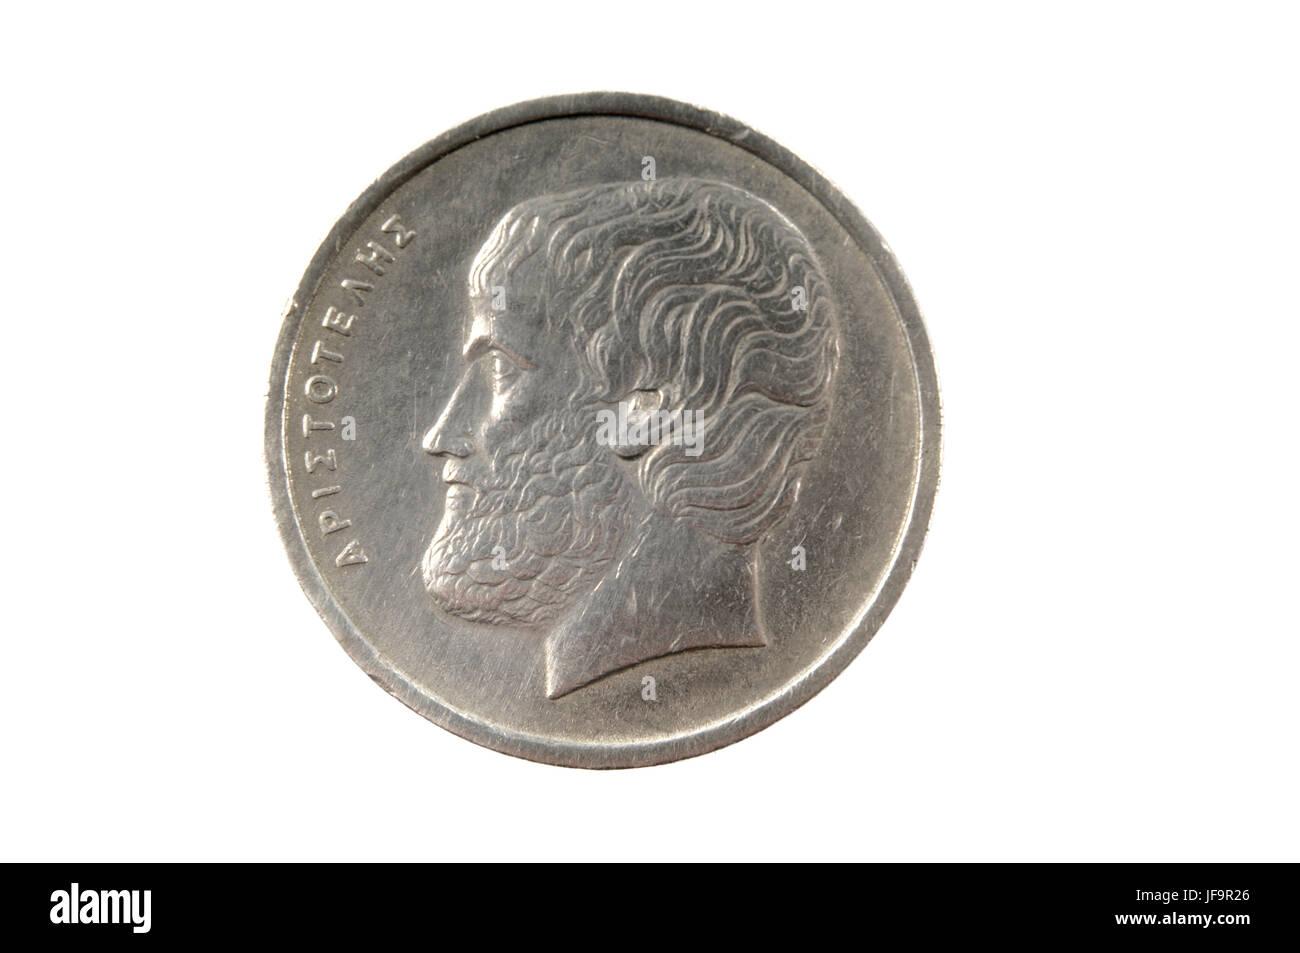 Greek Drachma Coin, 5 drachmas - Stock Image